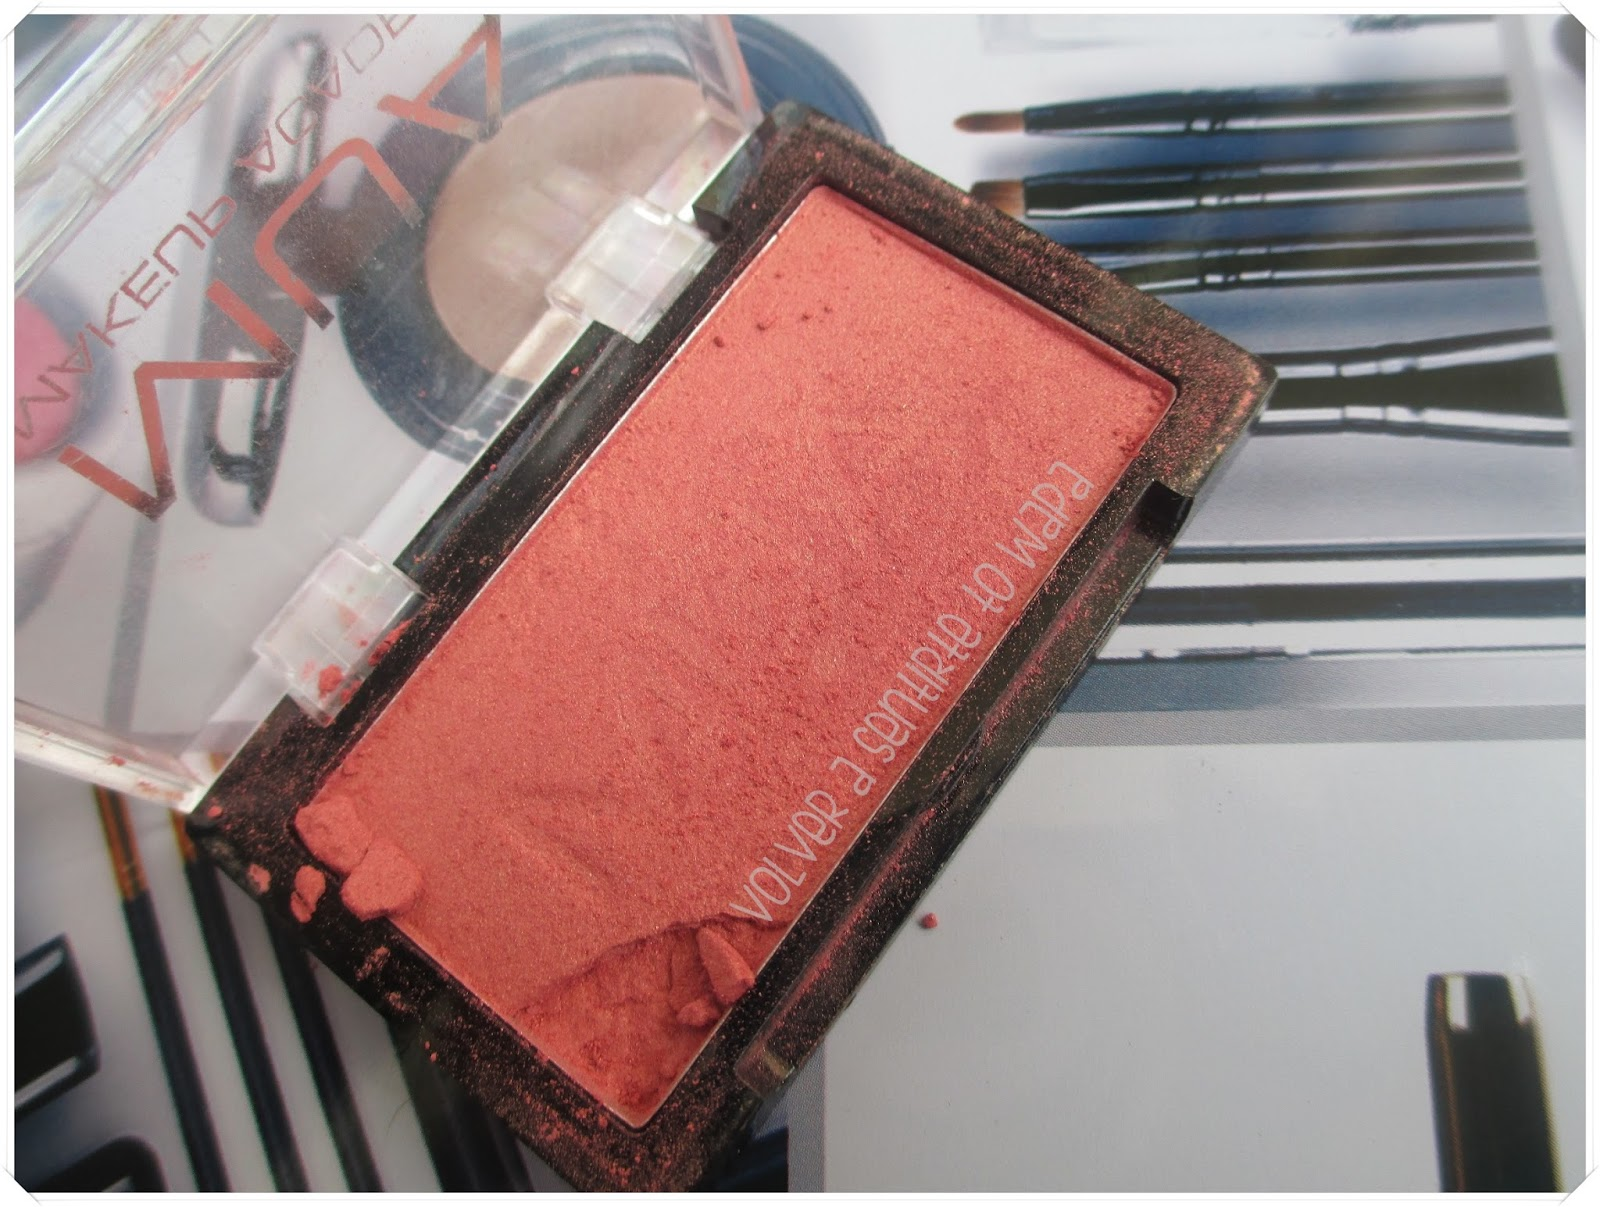 3 coloretes low cost para pieles claras - tono 5 de MUA